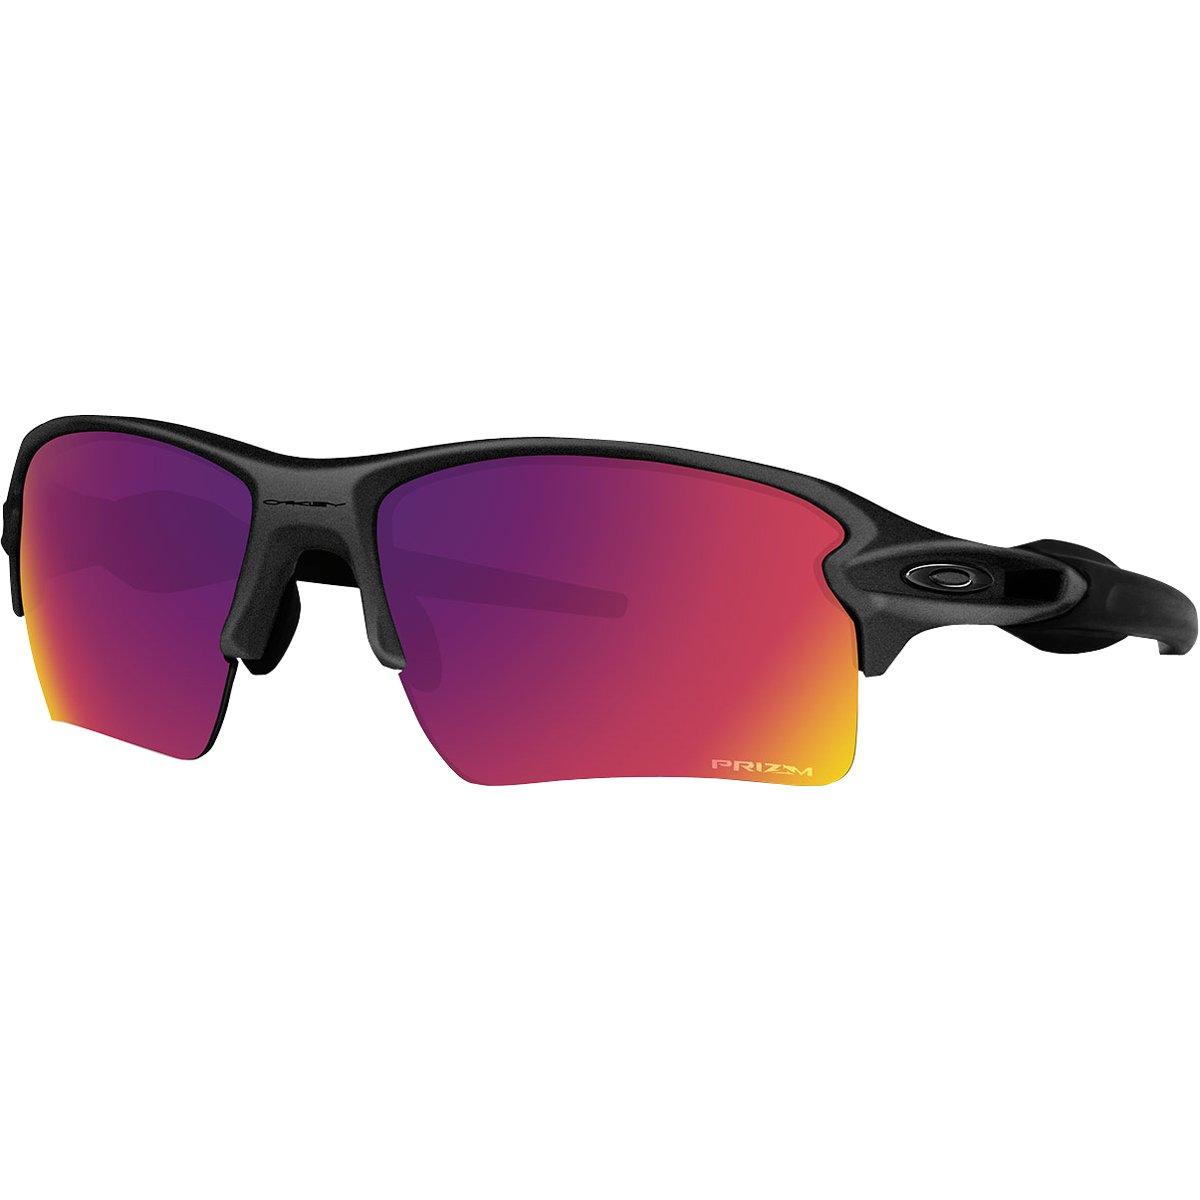 Oakley Adult Flak 2.0 Asian Fit Sunglasses, Steel/Prizm Road, One Size